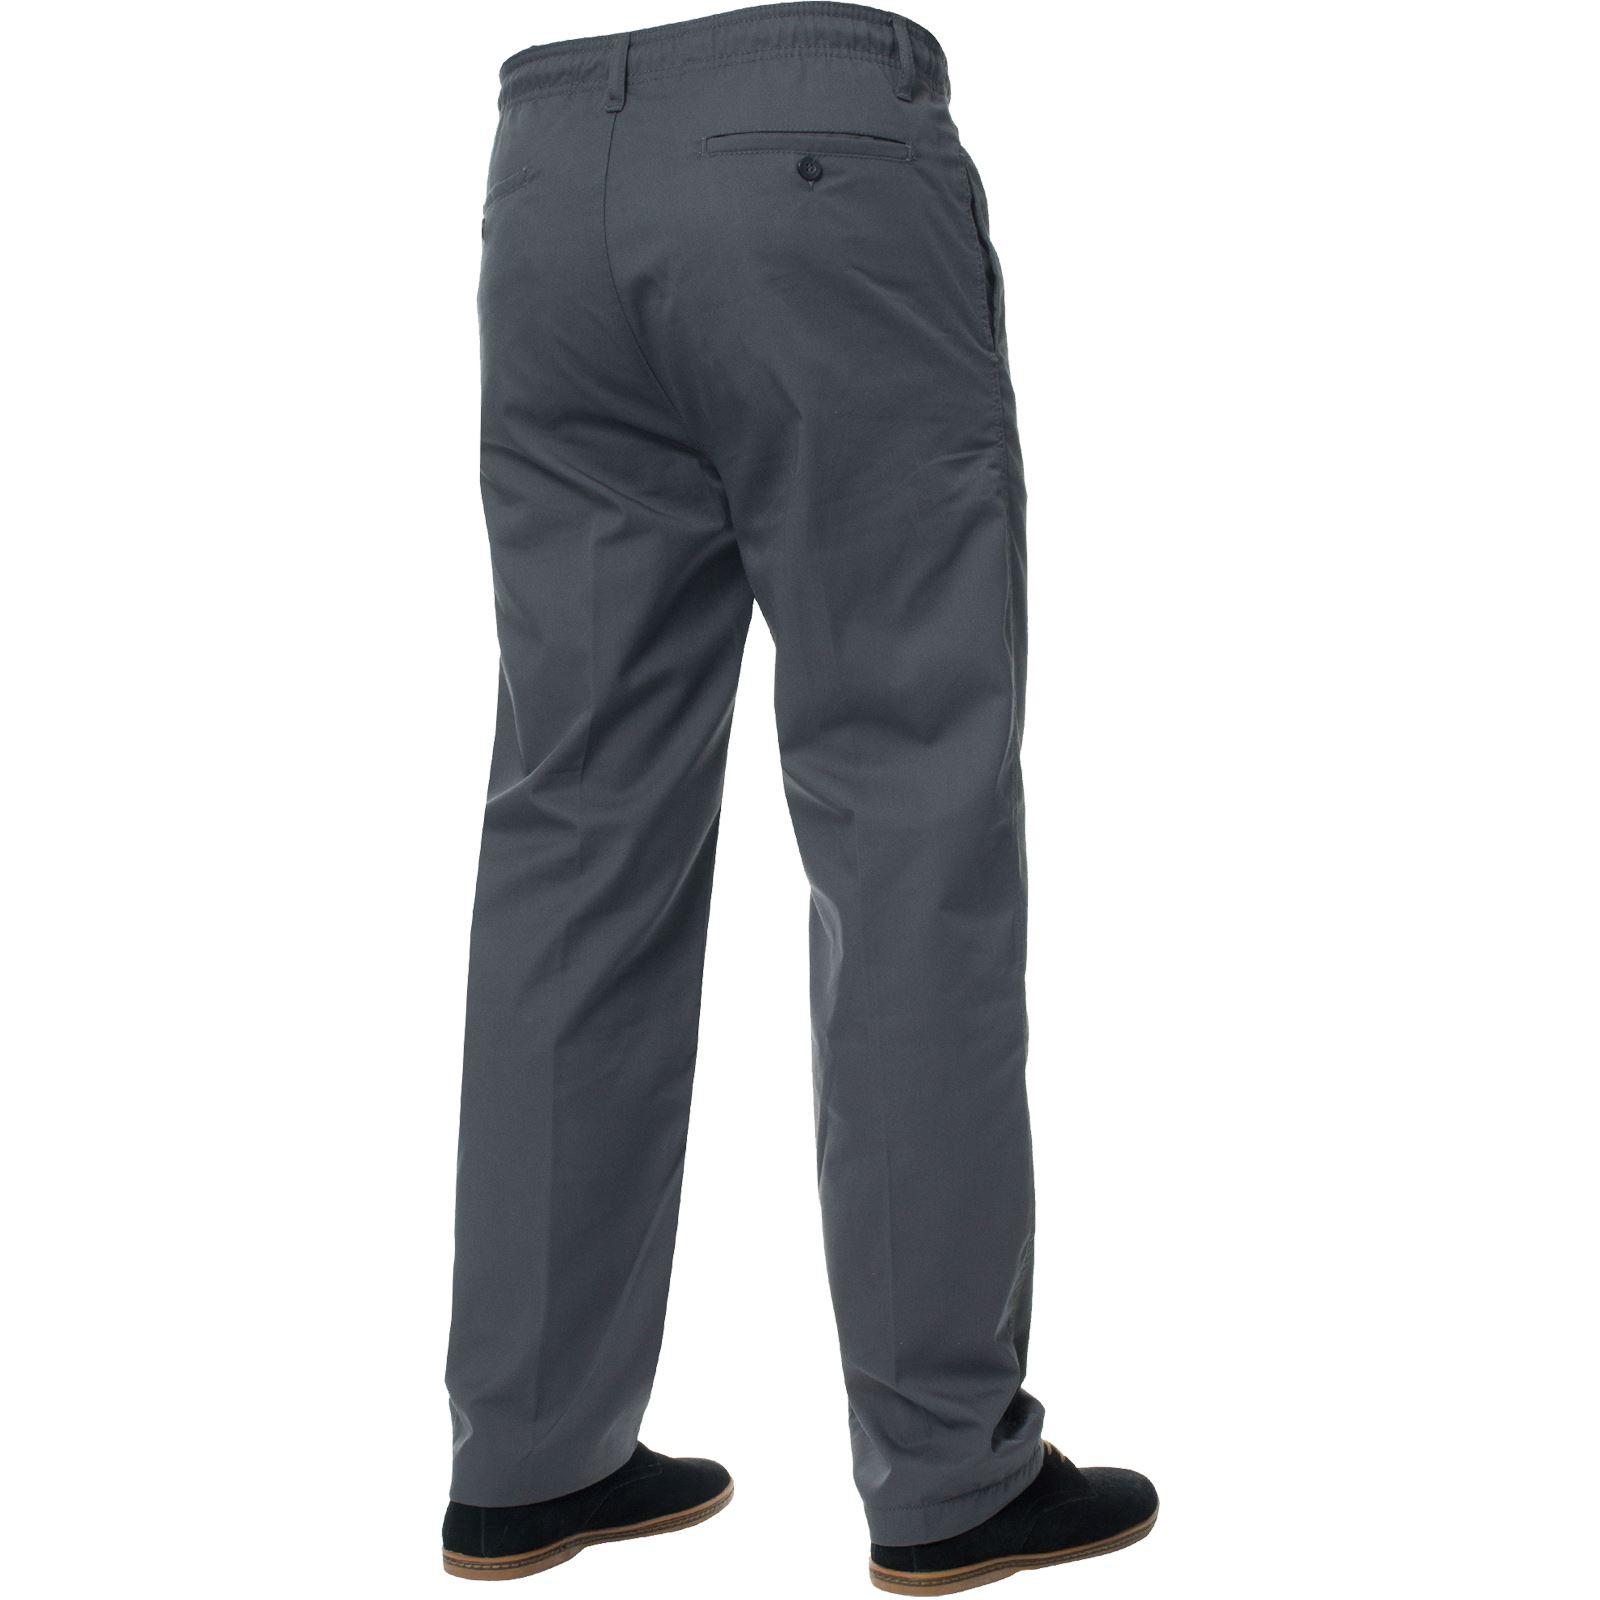 Kruze-Mens-Rugby-Trousers-Elasticated-Waist-Drawstring-Pants-Regular-King-Sizes thumbnail 21